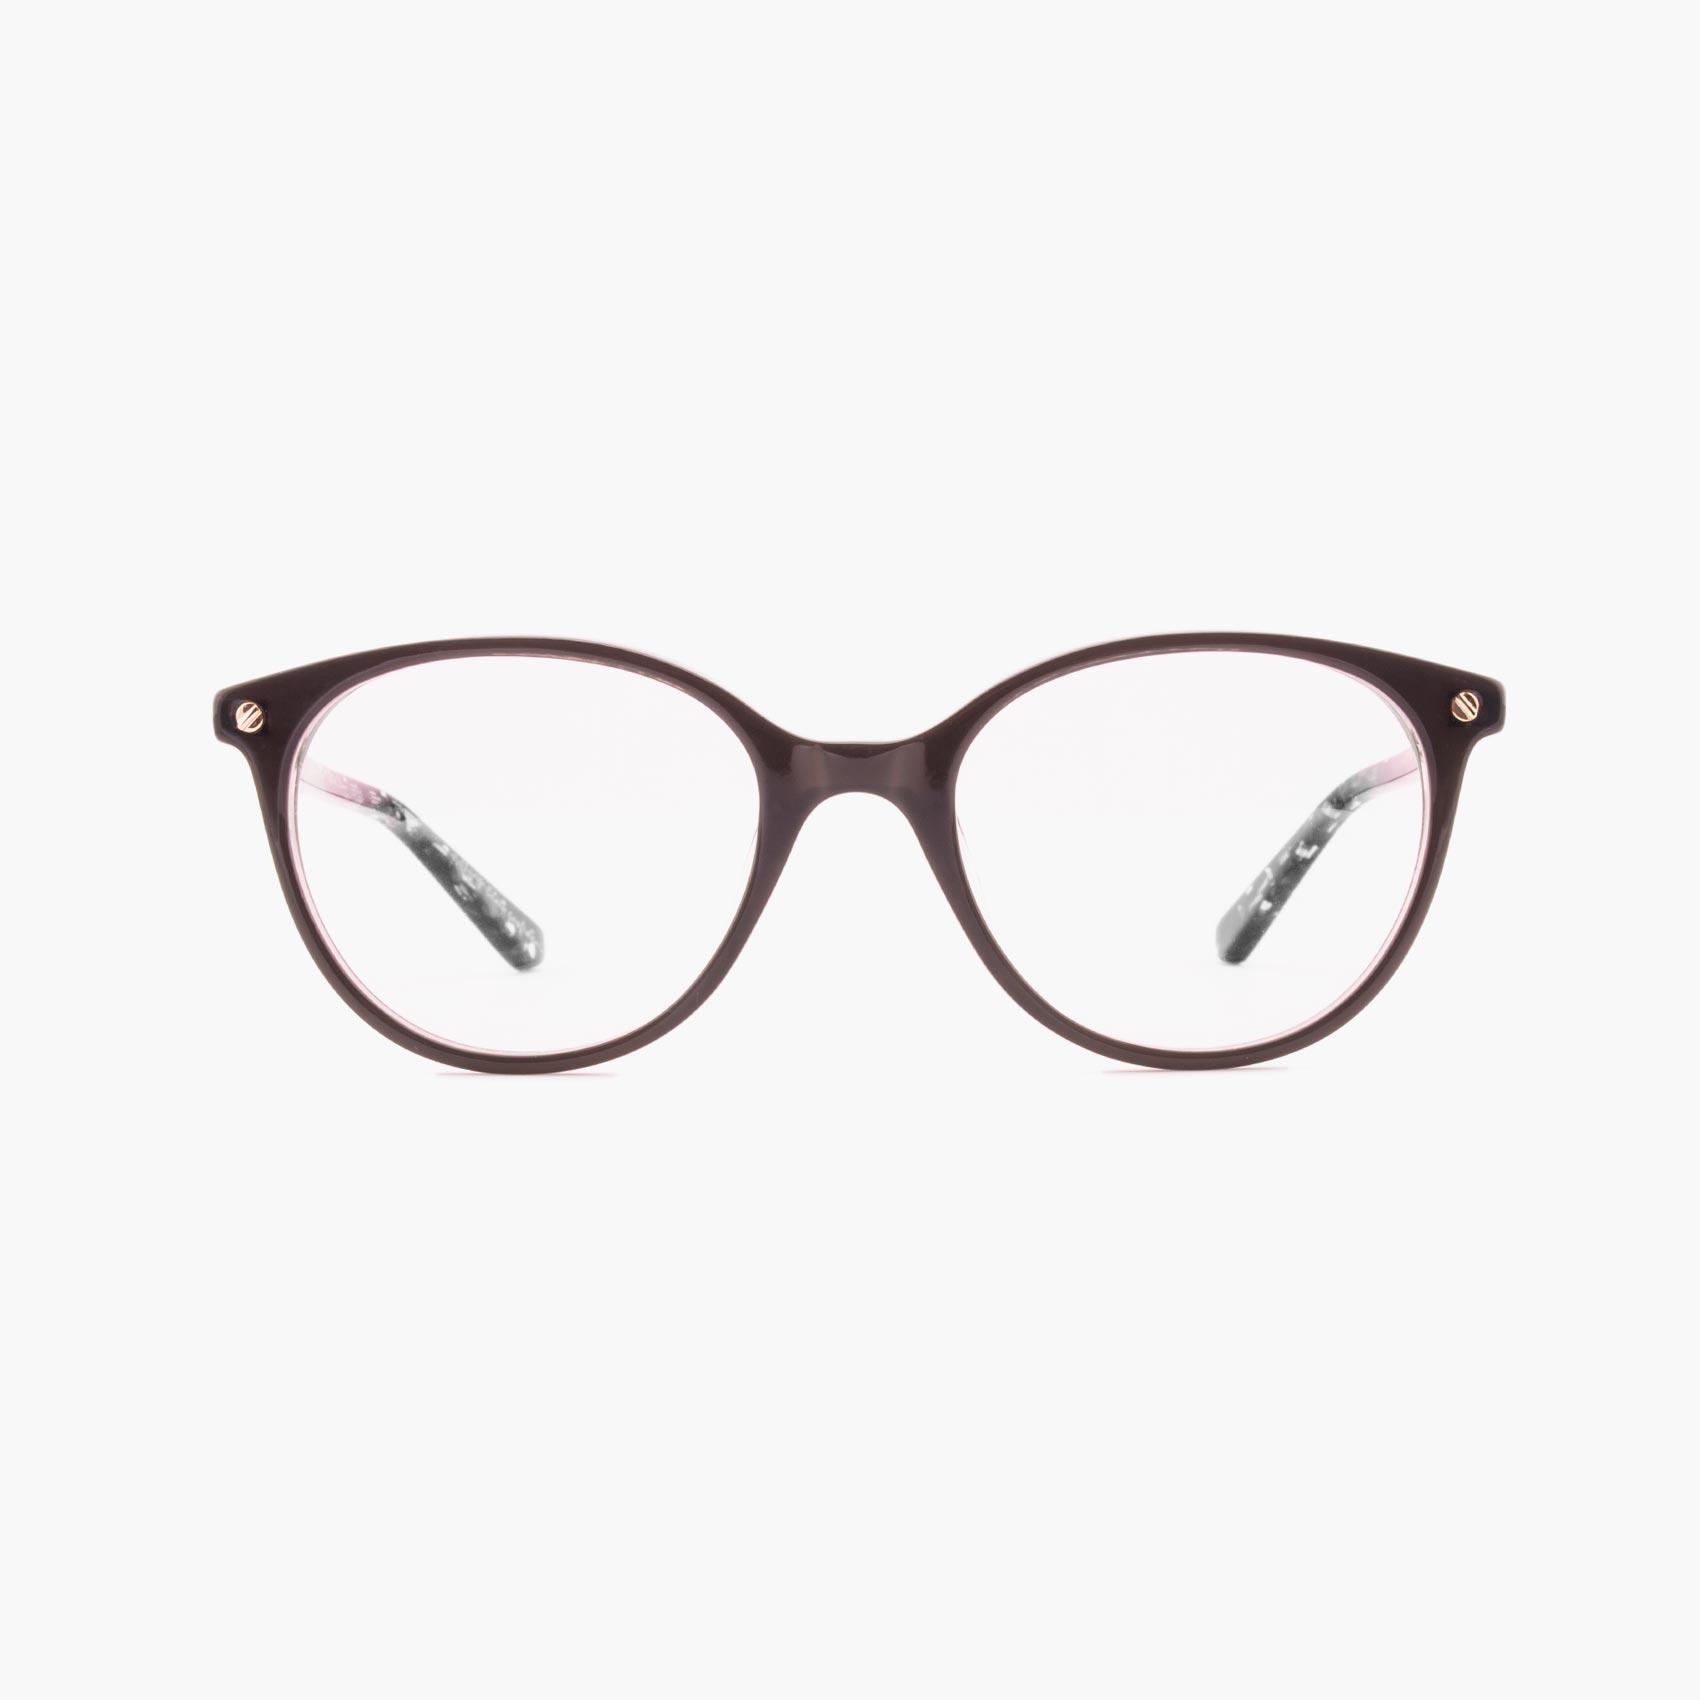 Proud eyewear Charlize C3 F gafas de acetato mujer responsables